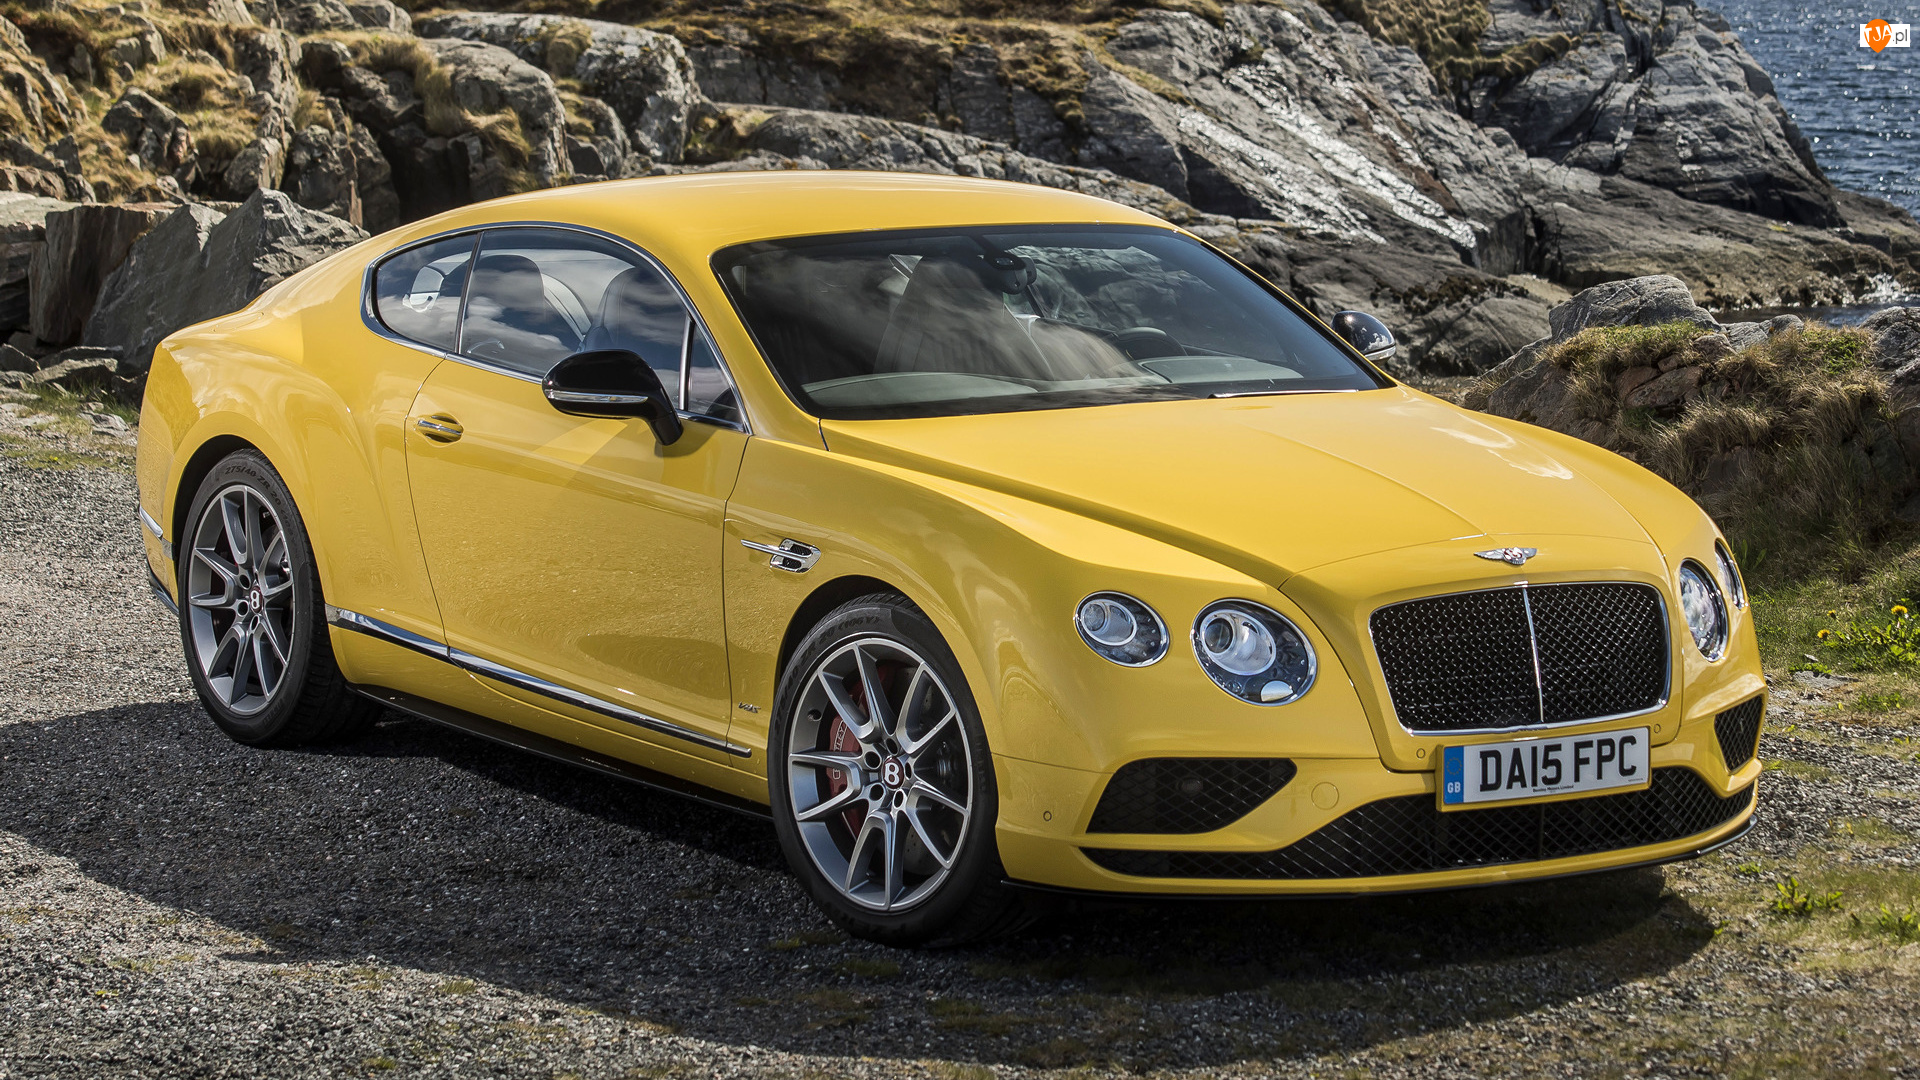 Bentley Continental GT, Żółty